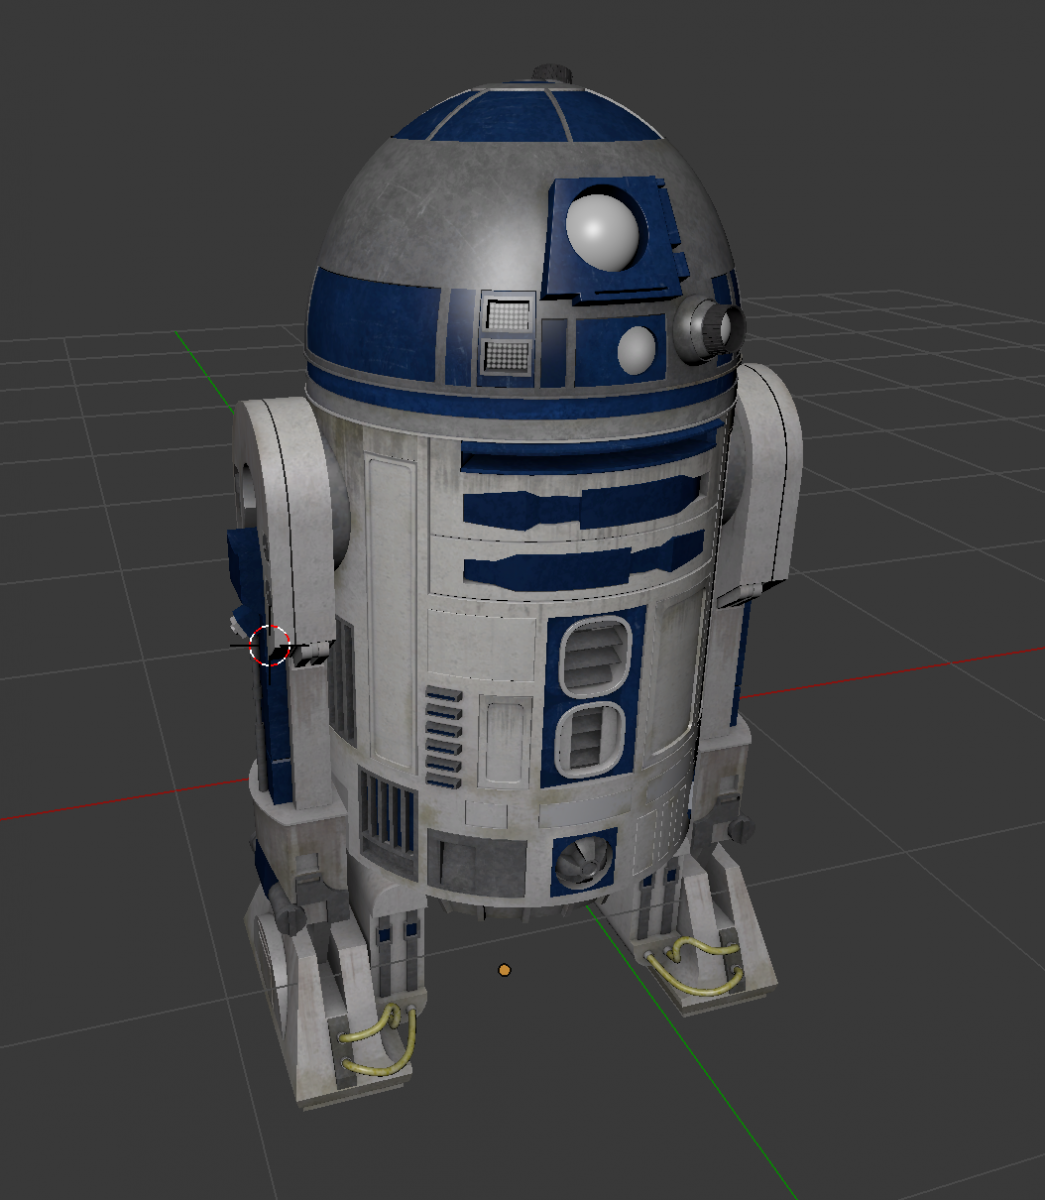 Render 3D Star Wars: The Force Awakens models in Blender and